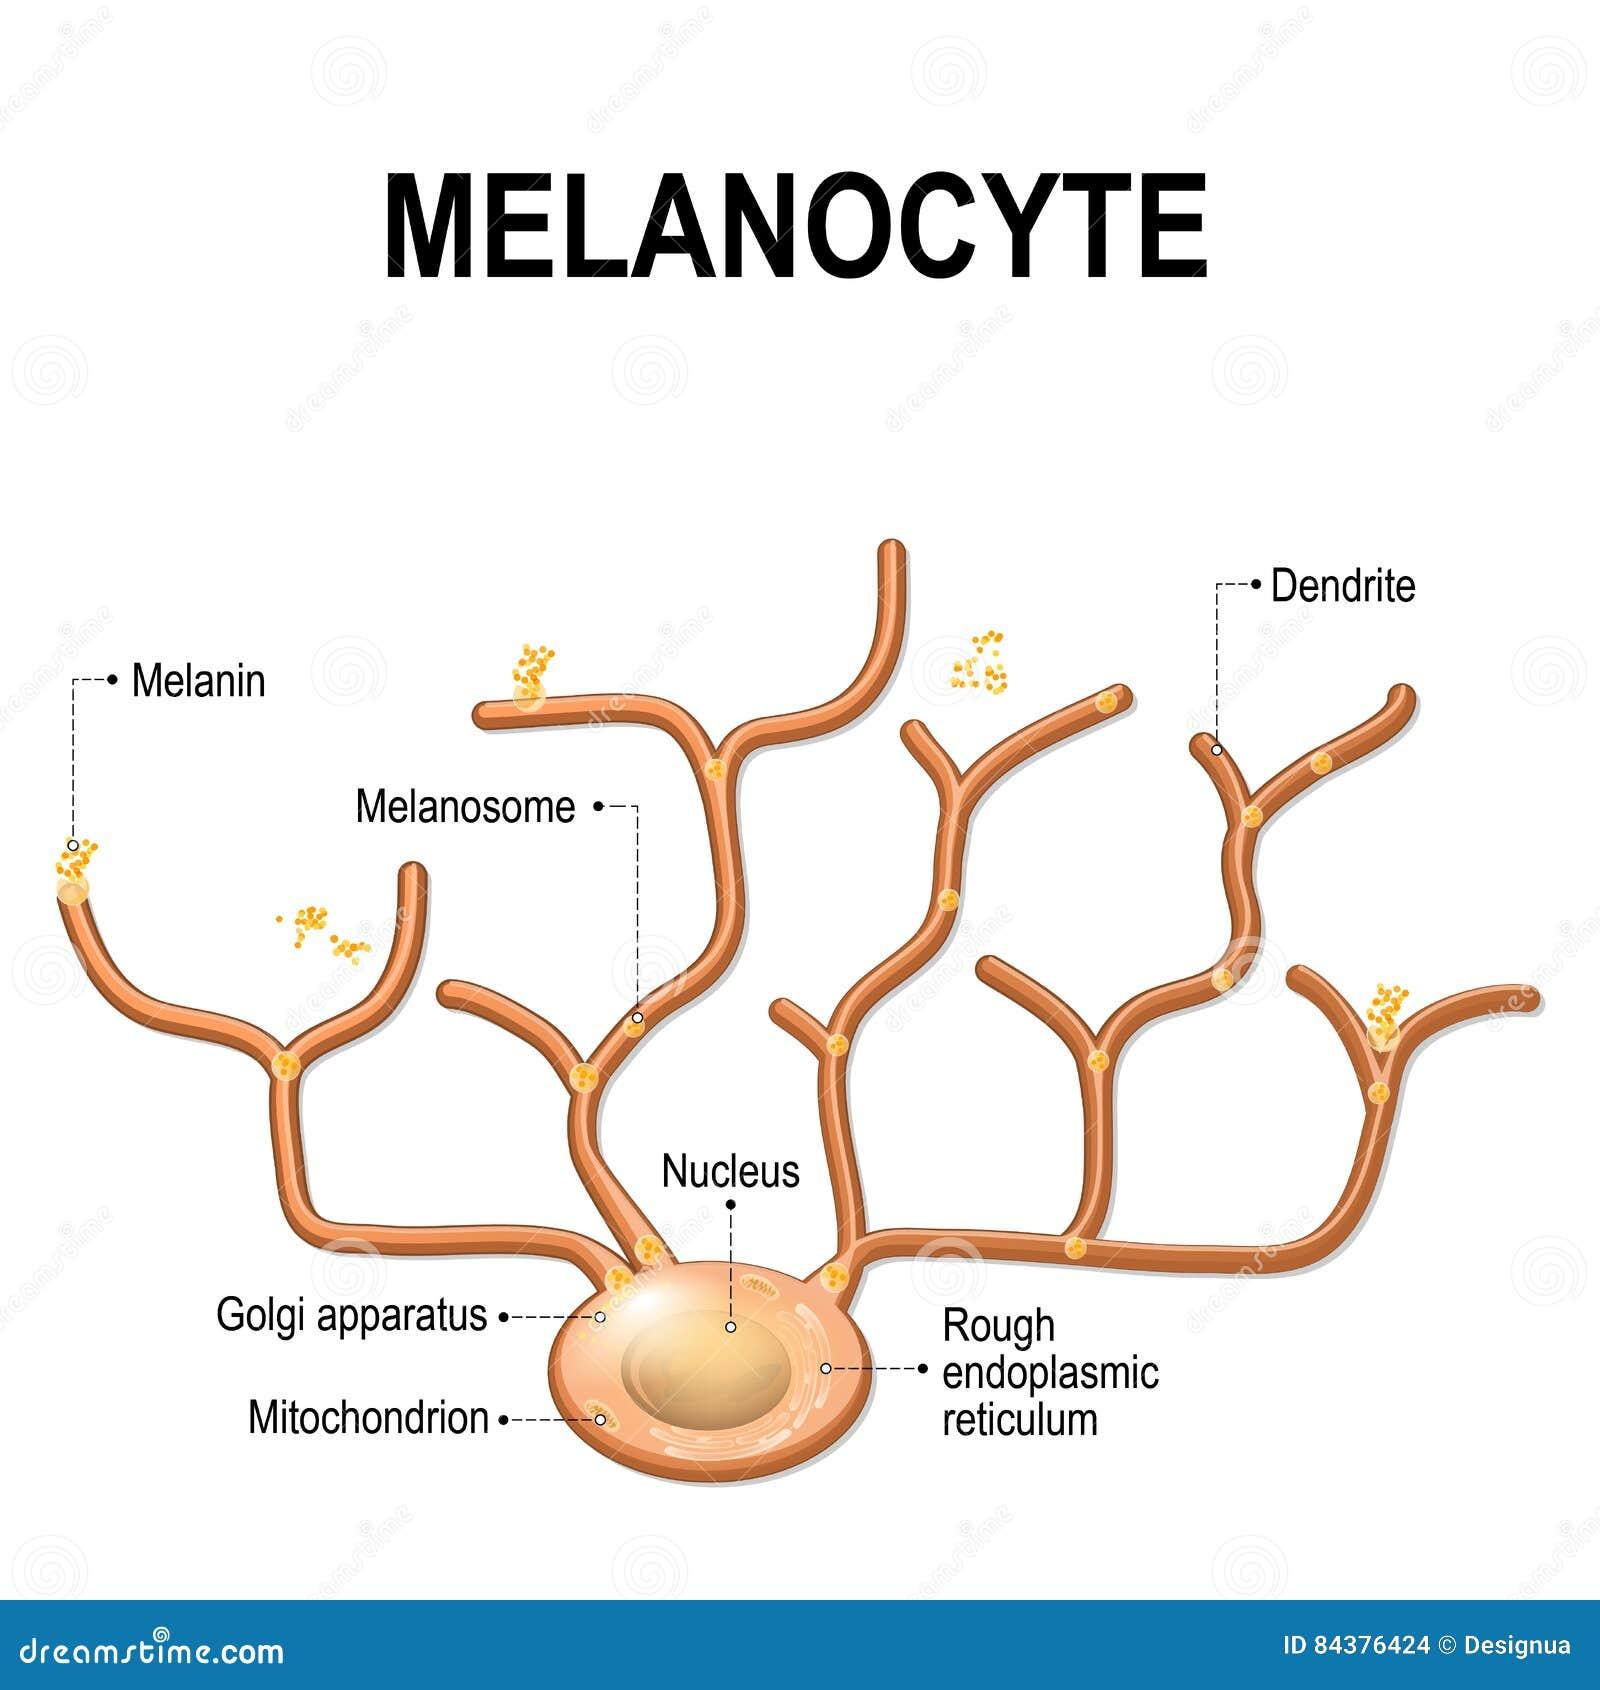 Melanocyte, Melanin Und Melanogenesis Vektor Abbildung ... - photo#20